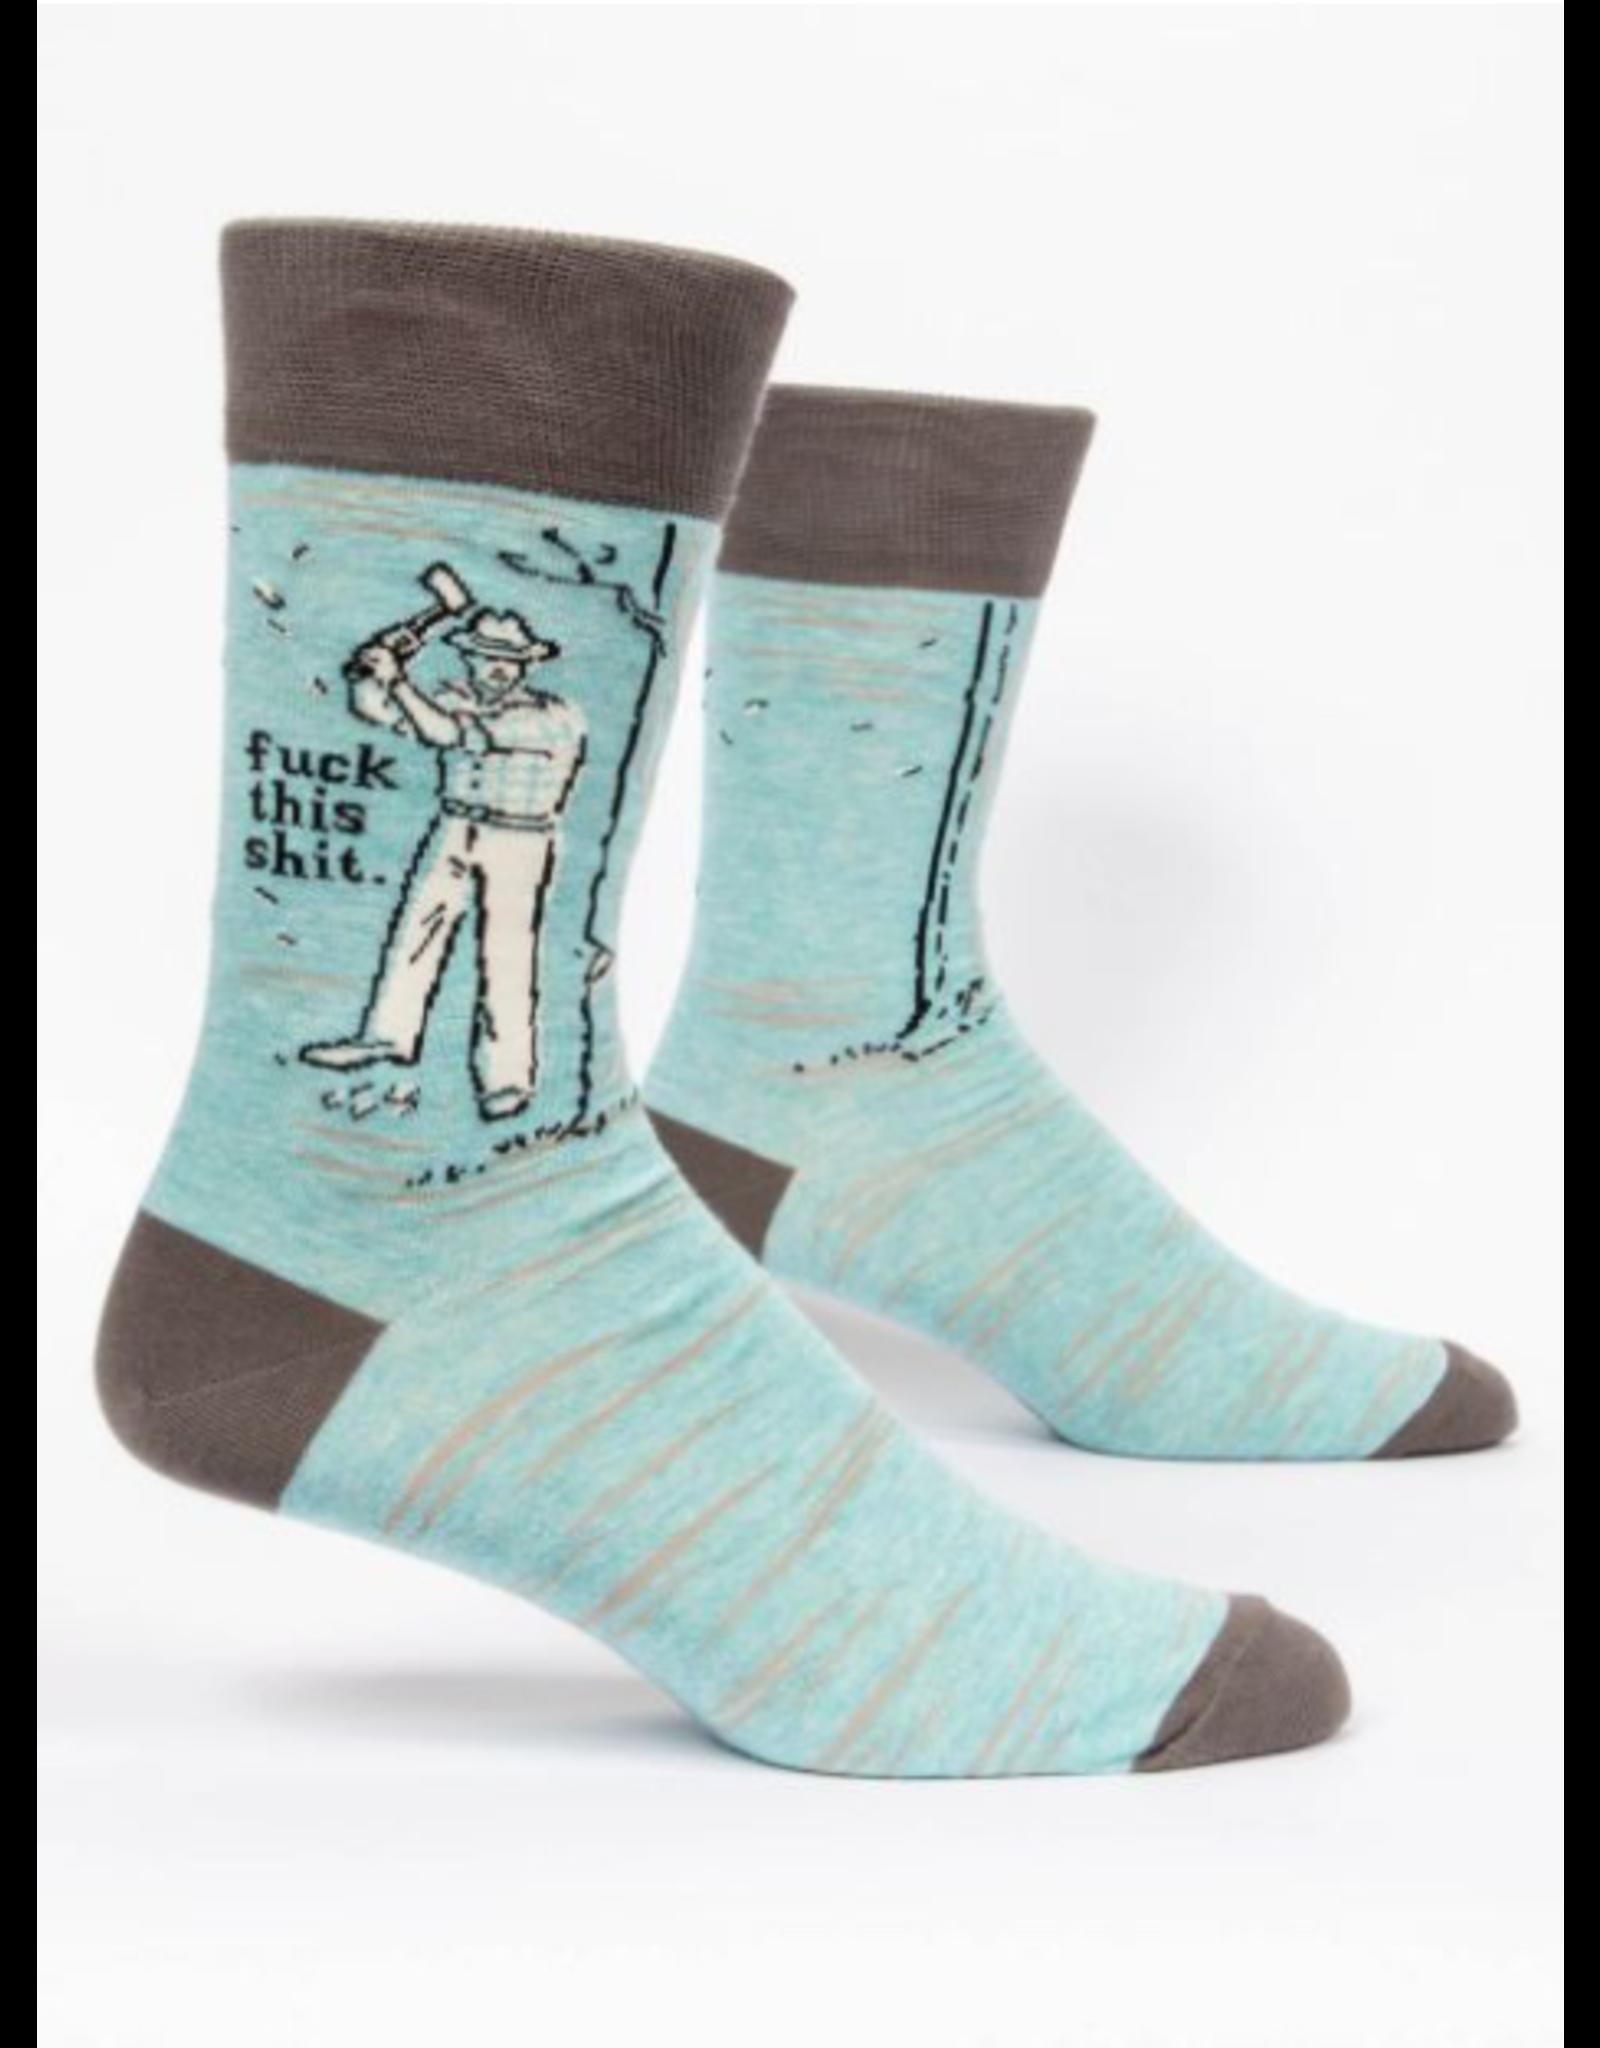 Blue Q Blue Q - Fuck This Shit crew socks (men's size)